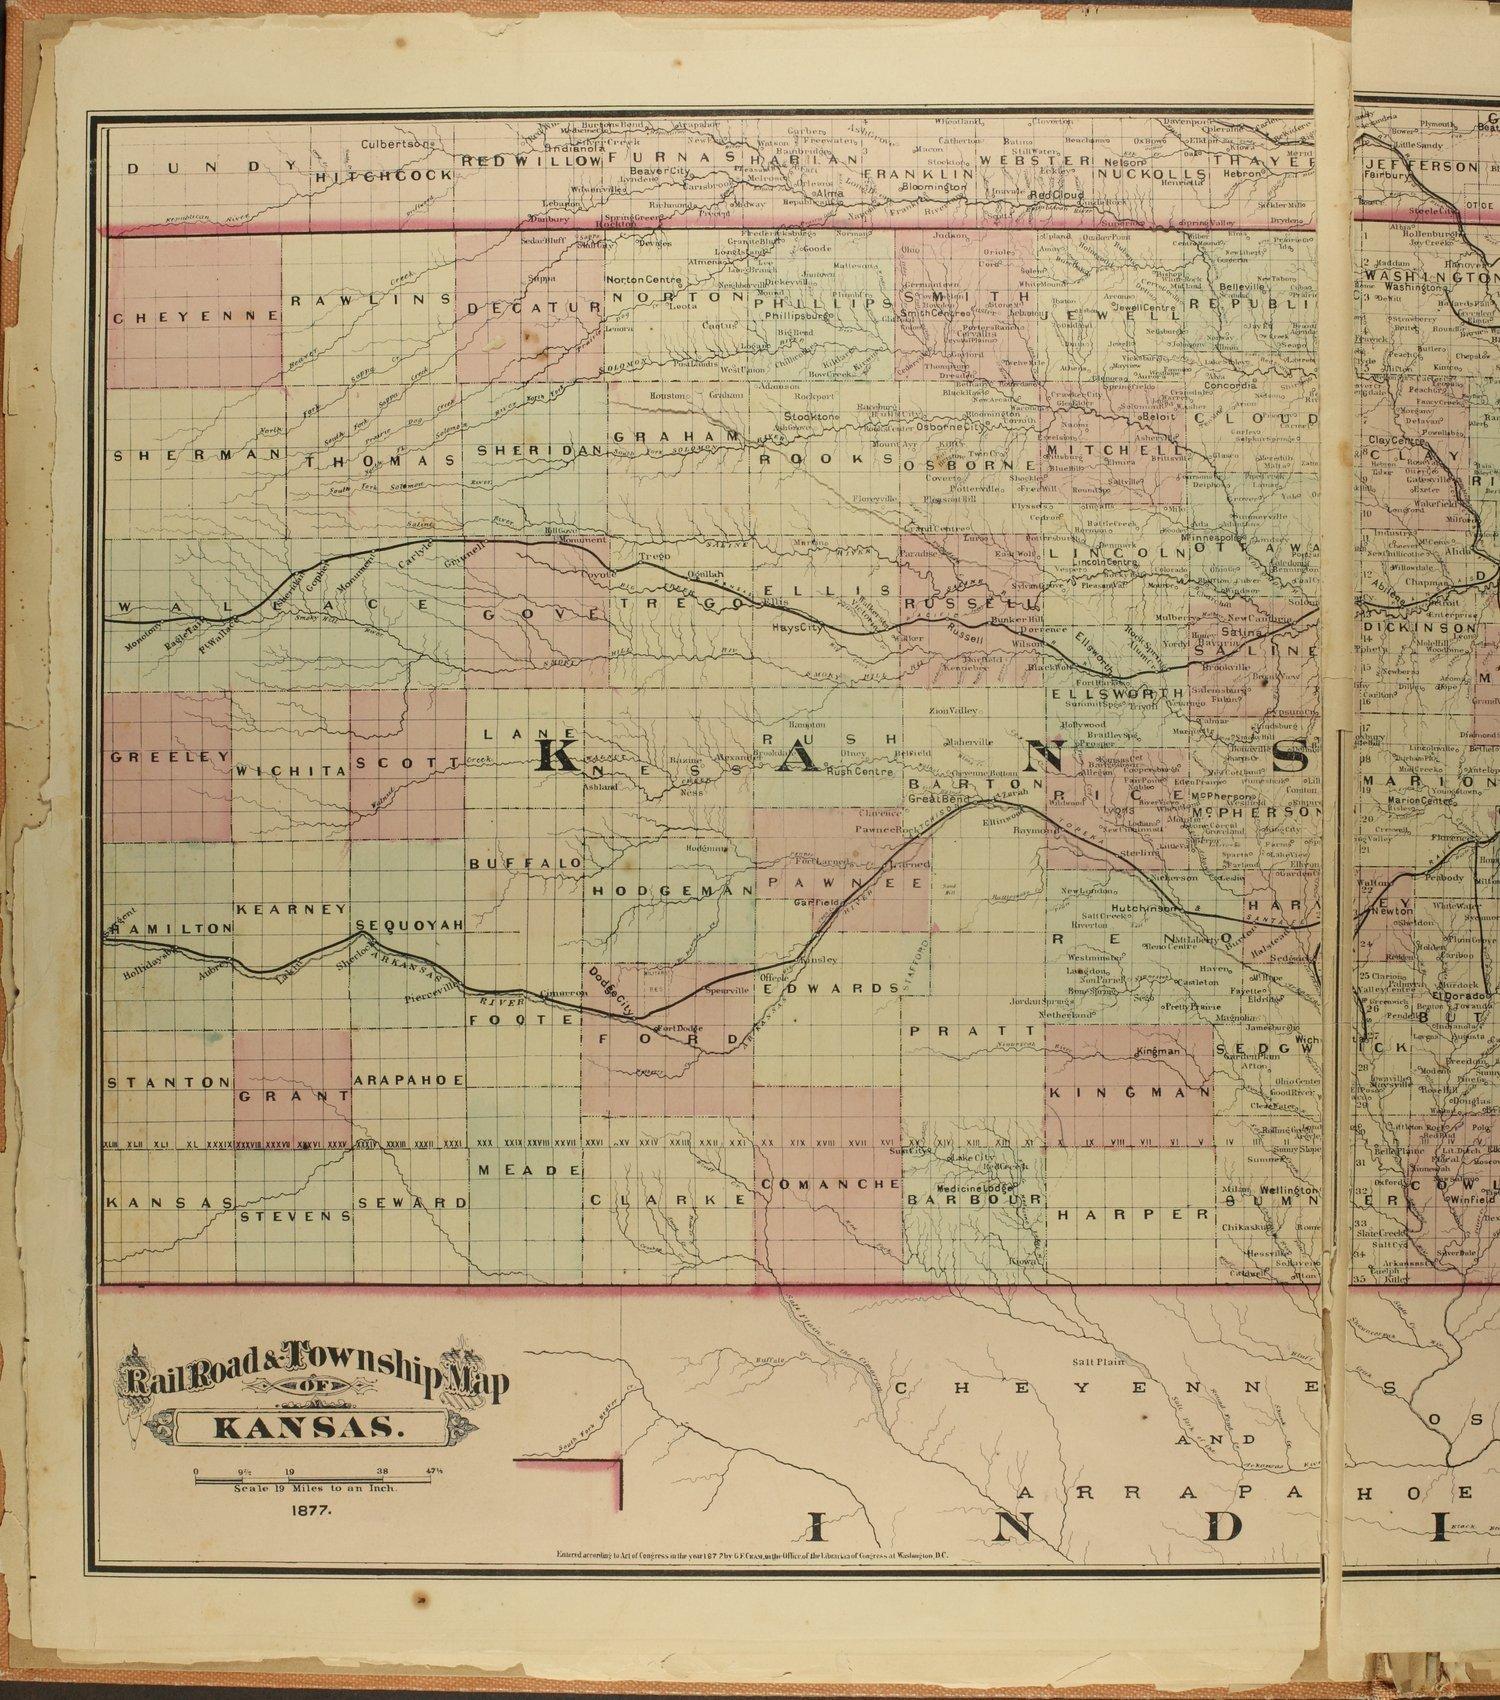 Atlas map of Leavenworth County, Kansas - 11